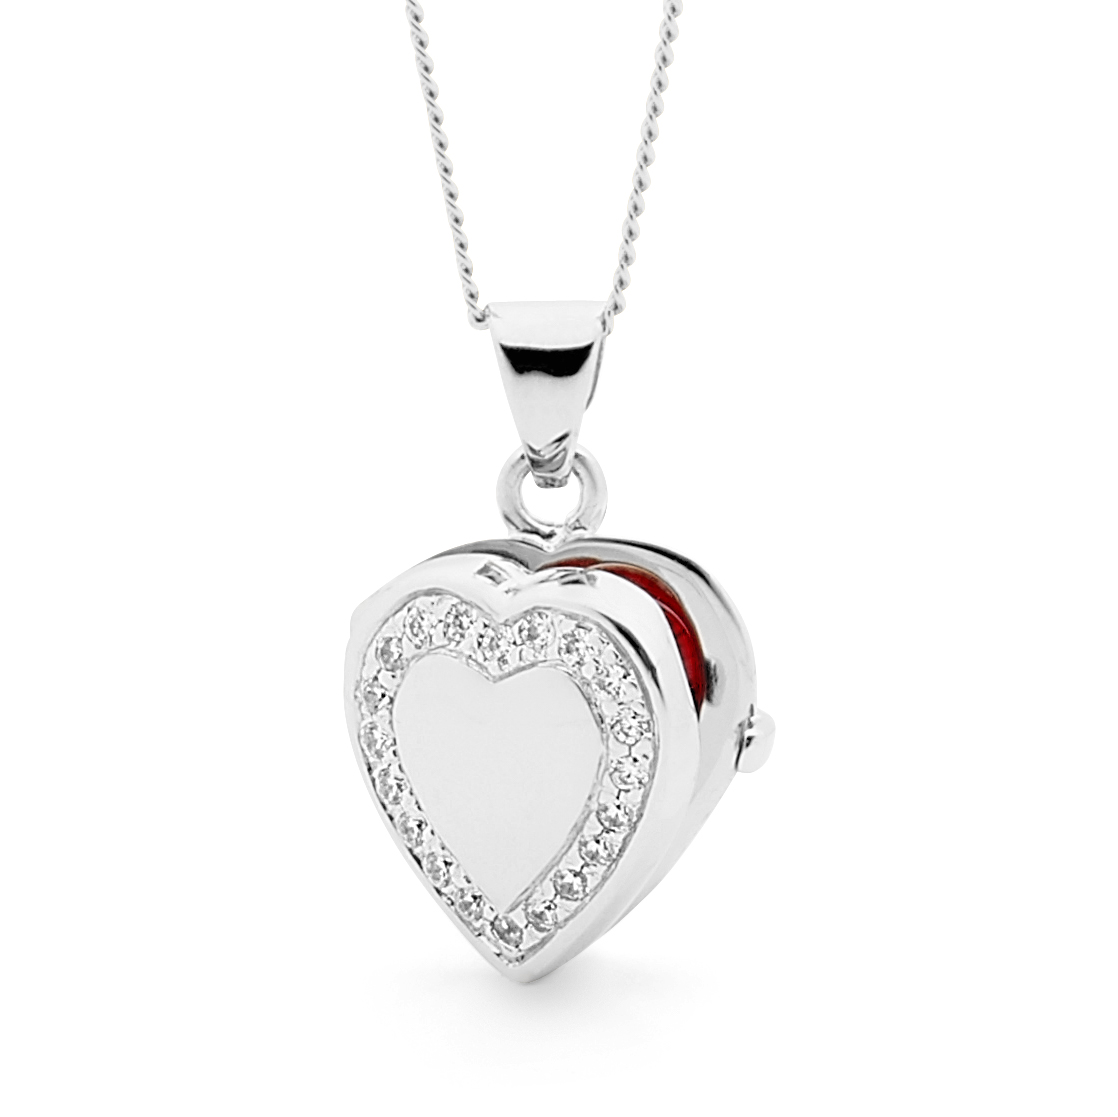 Cubic Zirconia Heart Locket Necklace in Sterling Silver